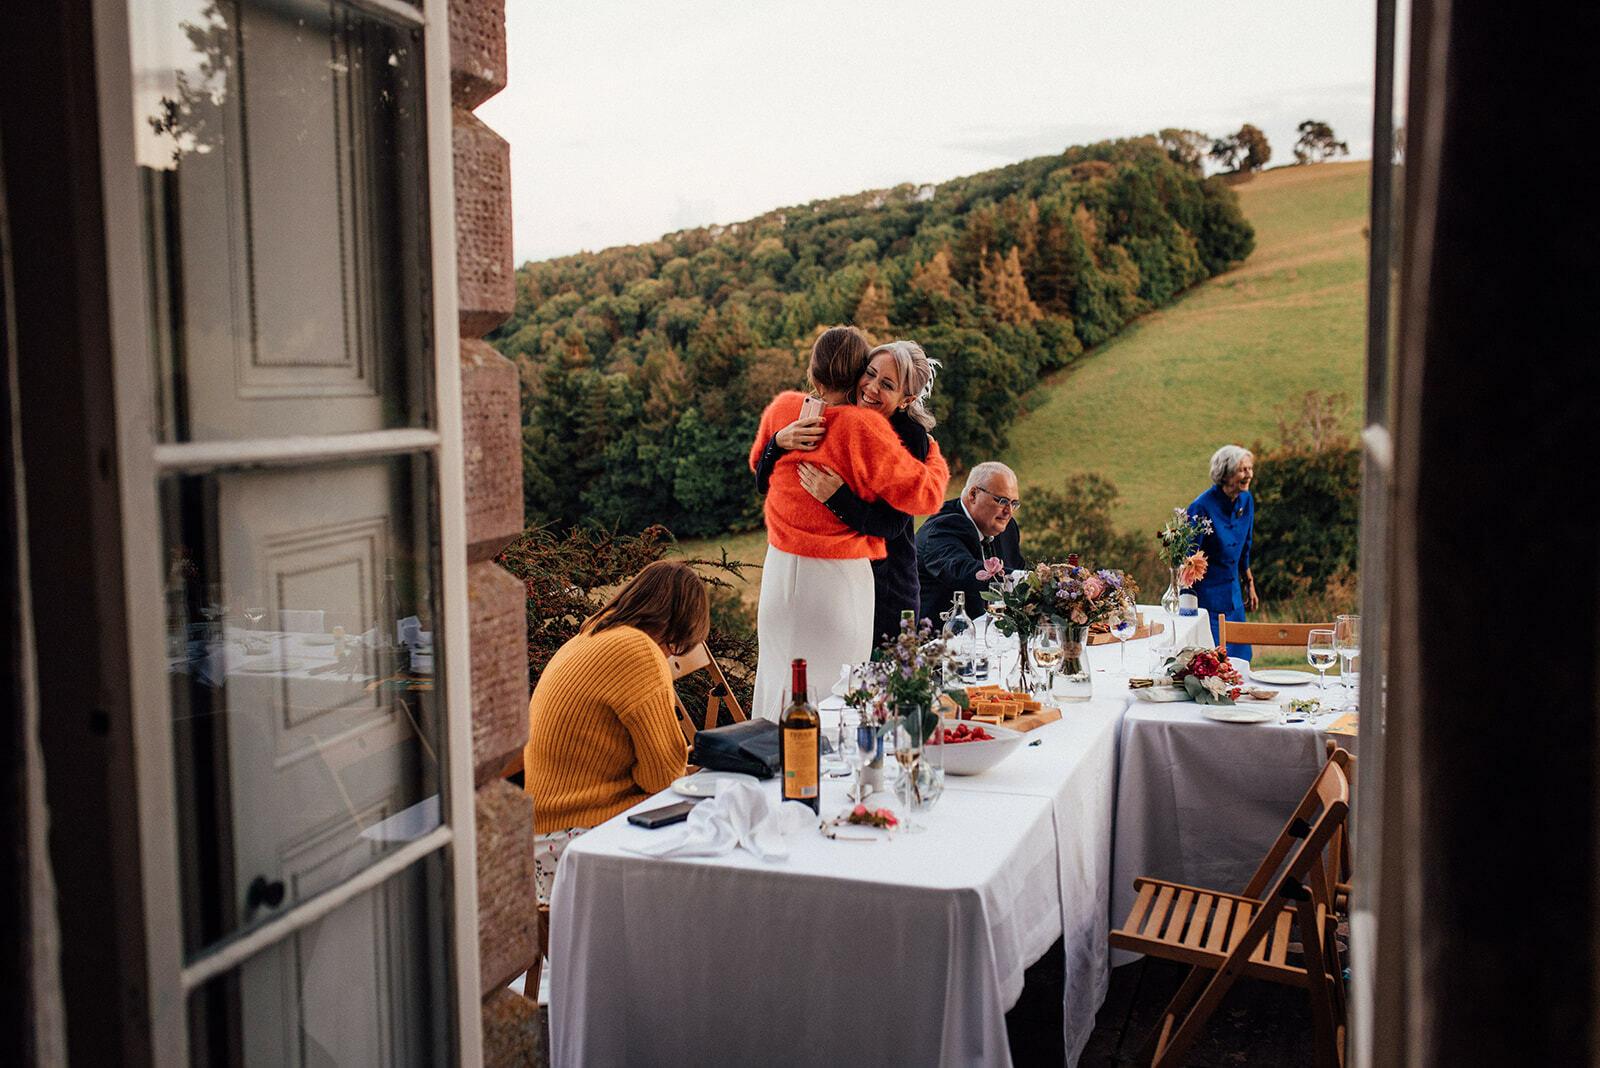 Bride hugs a guest during their alfresco wedding breakfast at Sharpham House